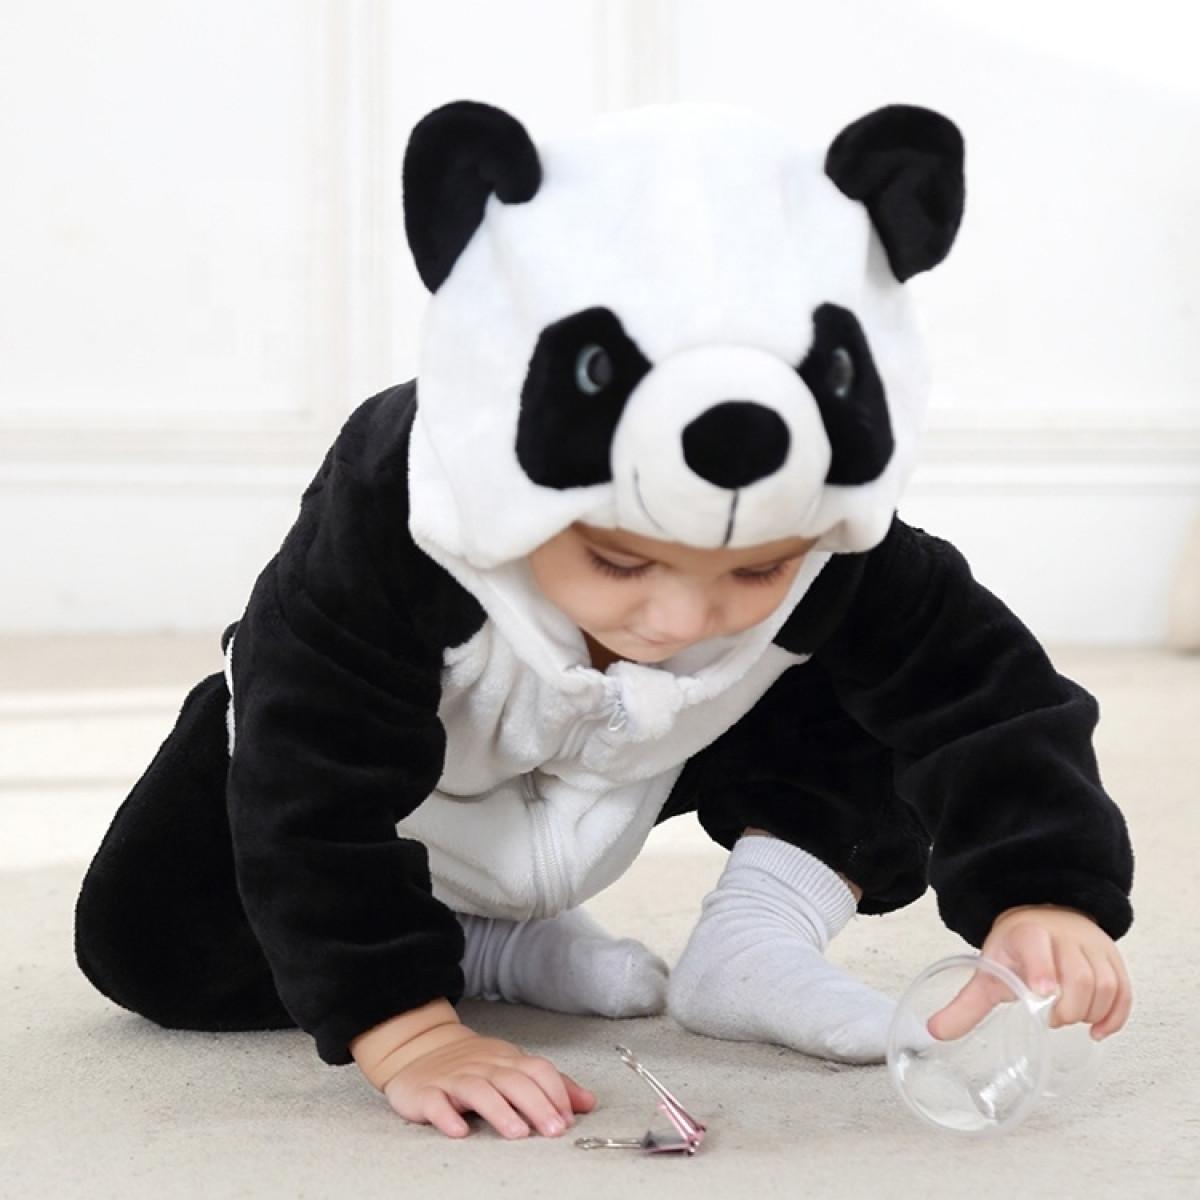 Kostum za maškare Panda 74504